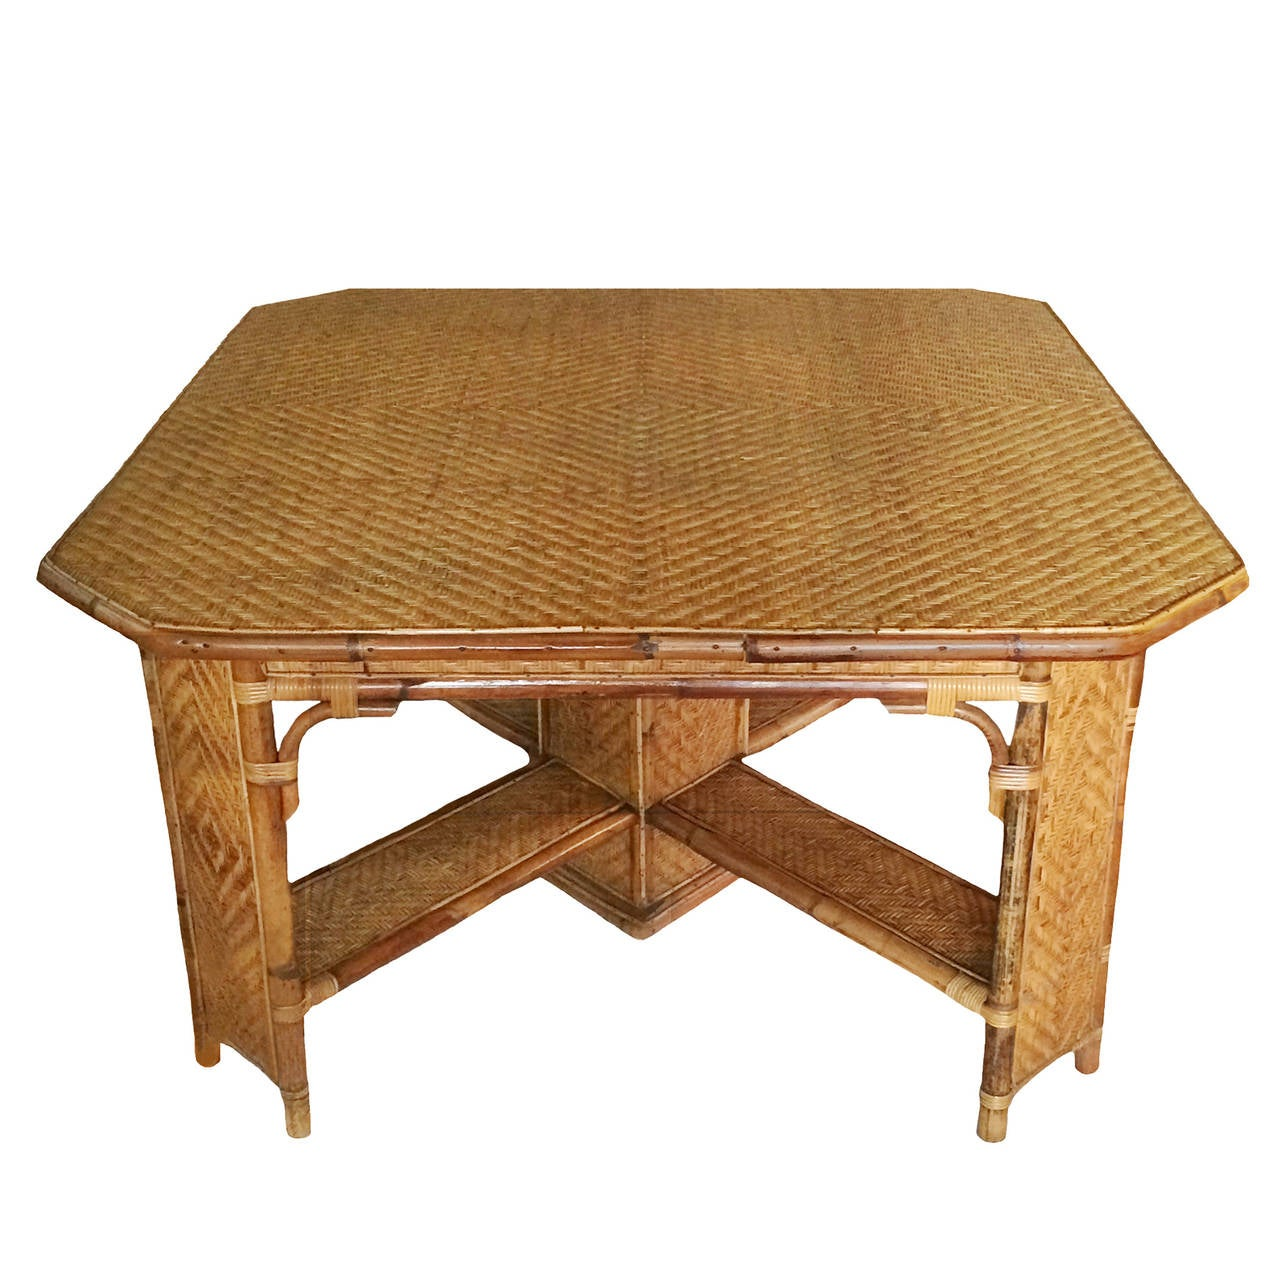 senior citizen chair desk edinburgh 19th century bamboo table at 1stdibs